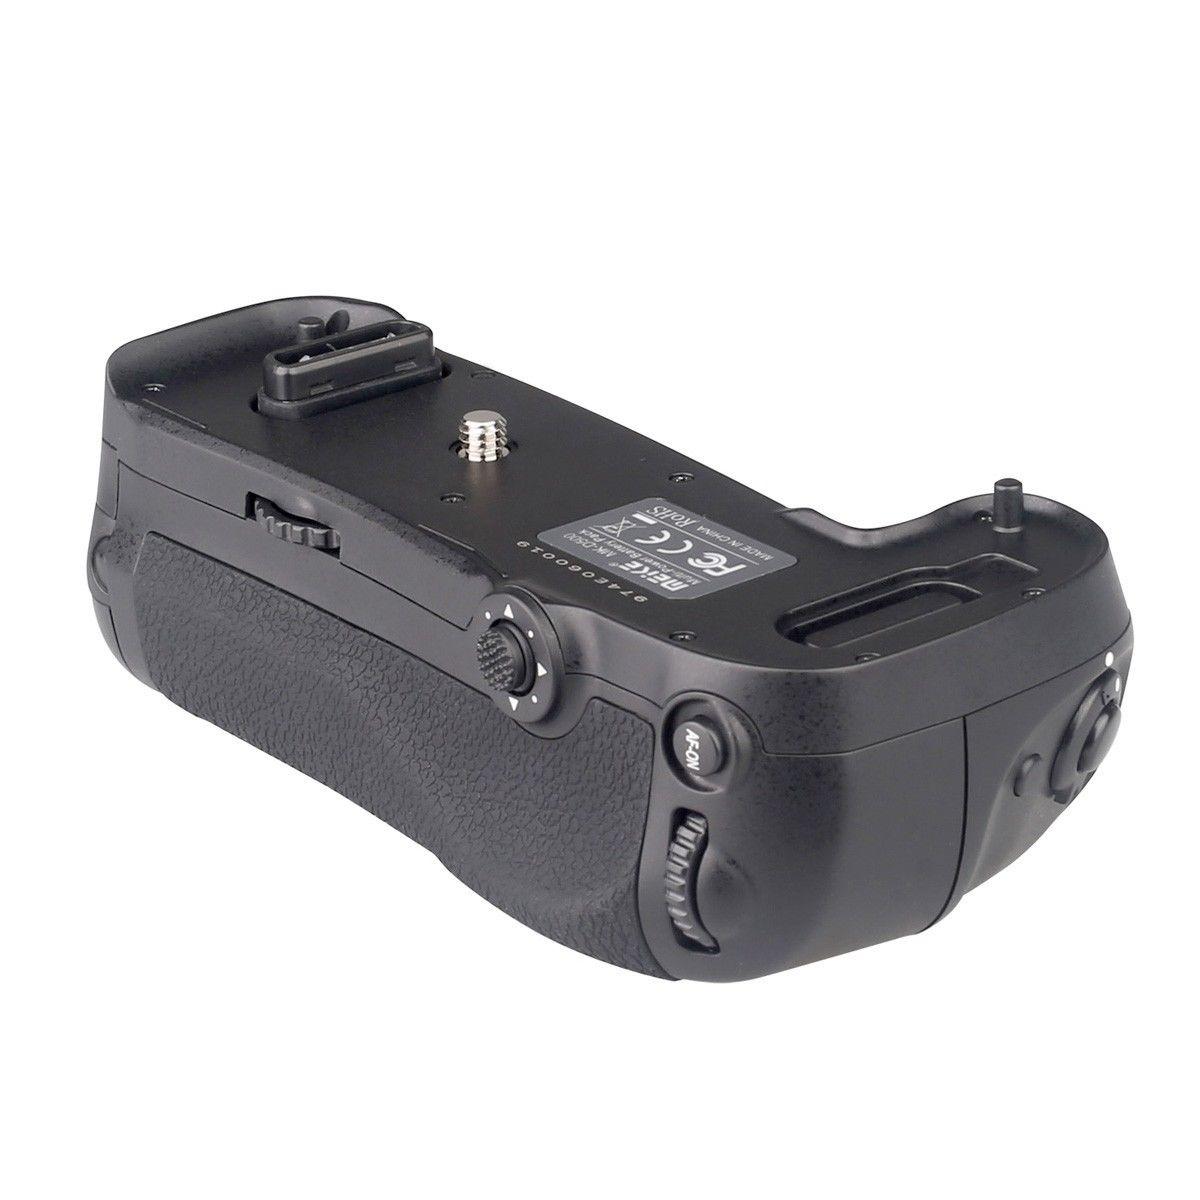 D17 Vertical Battery Grip hand pack holder for Nikon d500 EN-EL15 DSLR camera MB-D17 meike mk d500 vertical battery grip for nikon d500 as mb d17 for pixel vertax d17 2 pcs en el15 battery dual charger